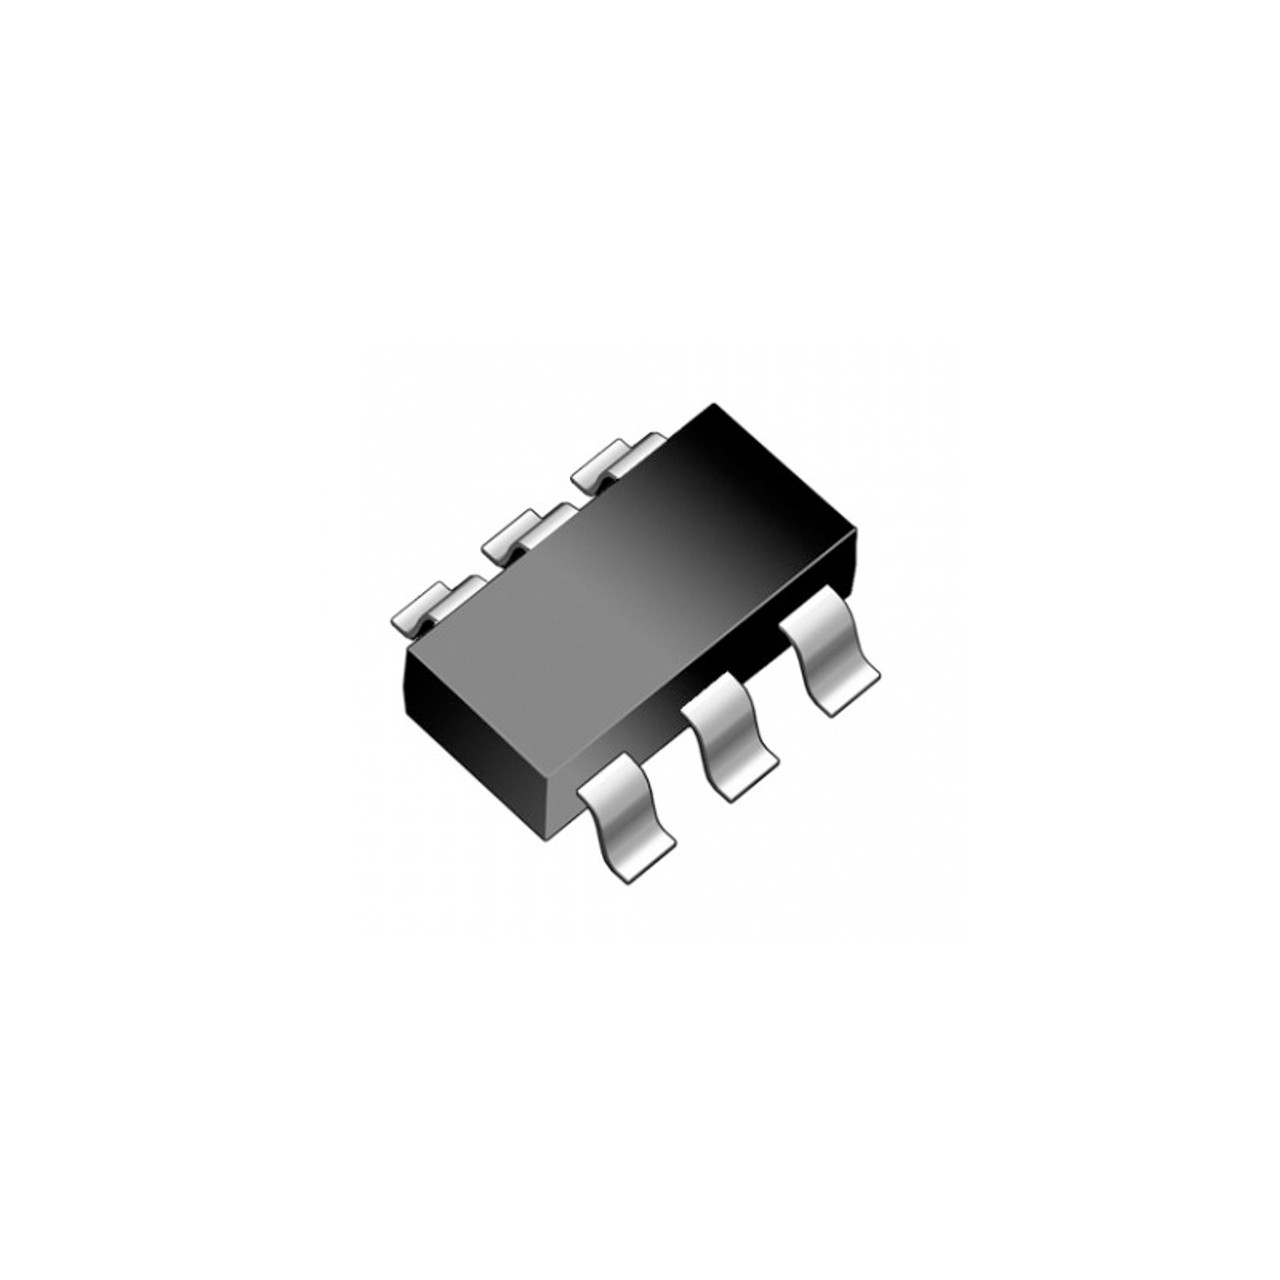 20*TP4057 Lithium Li-ion charge IC 500mA SOT-23-6